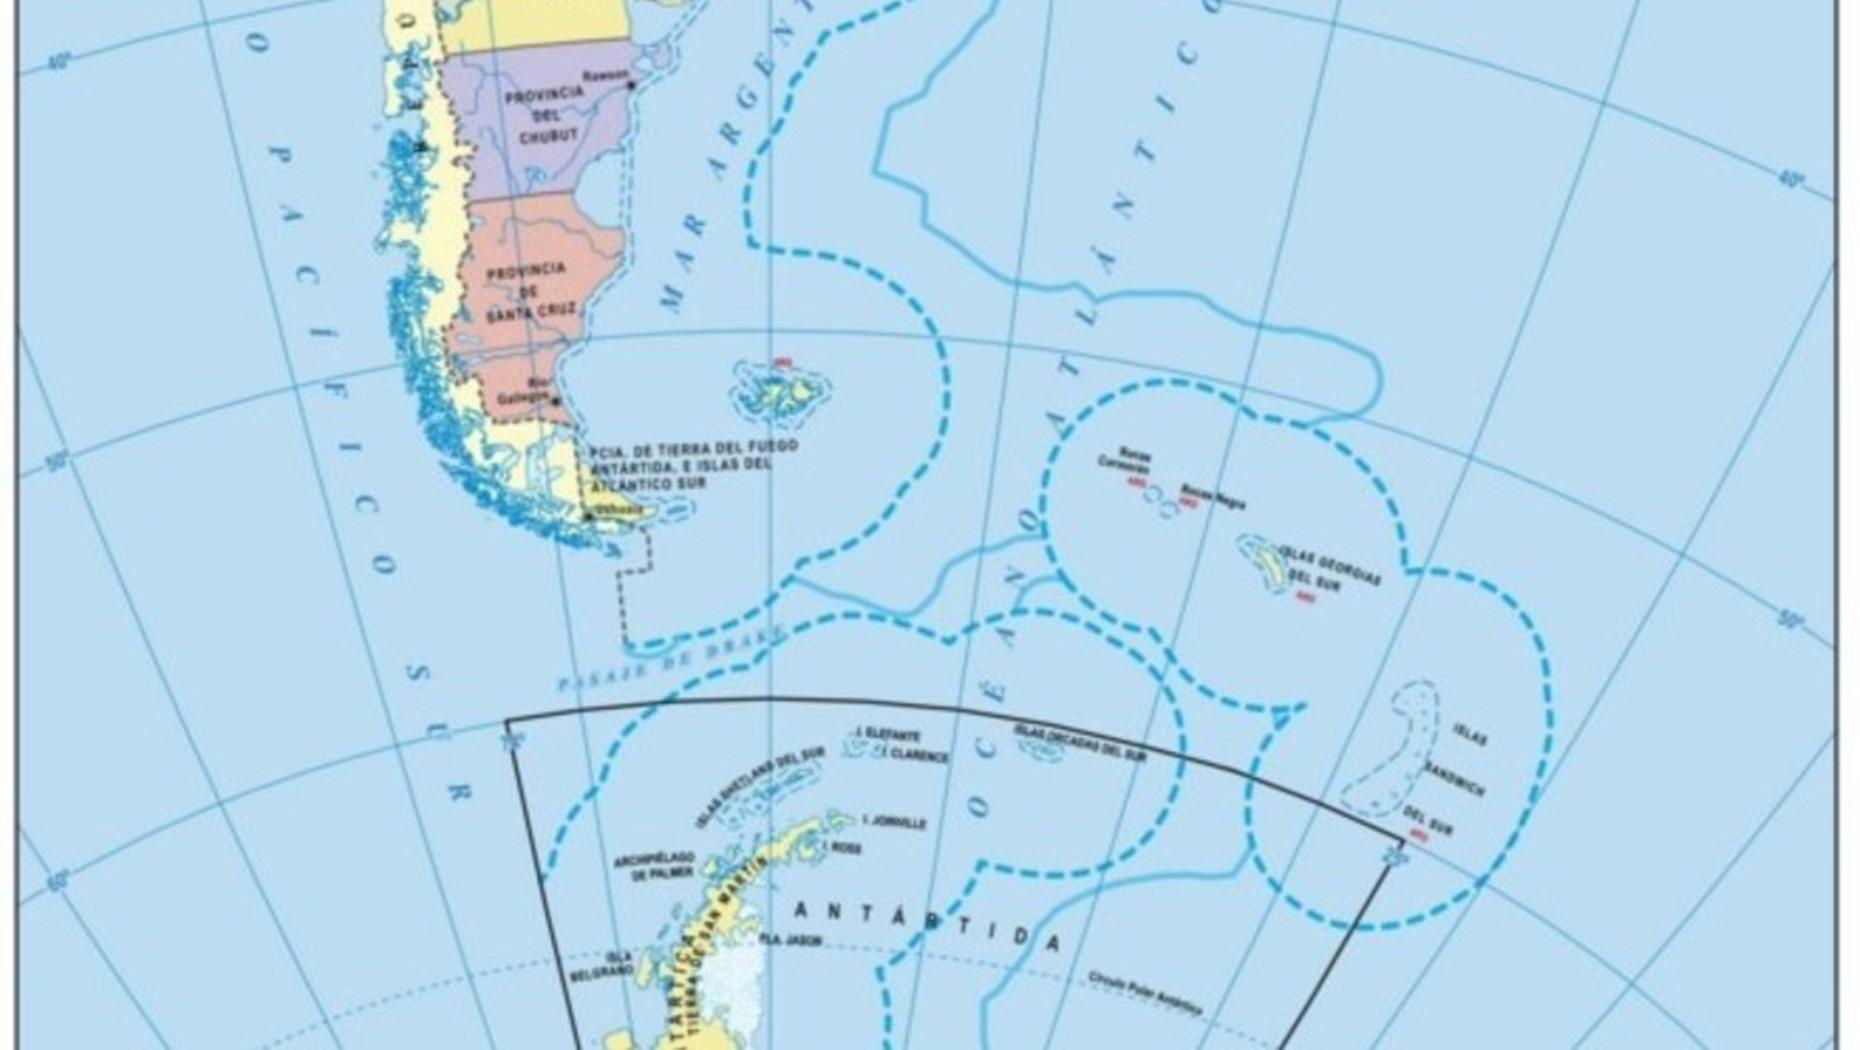 Islas-Malvinas-21